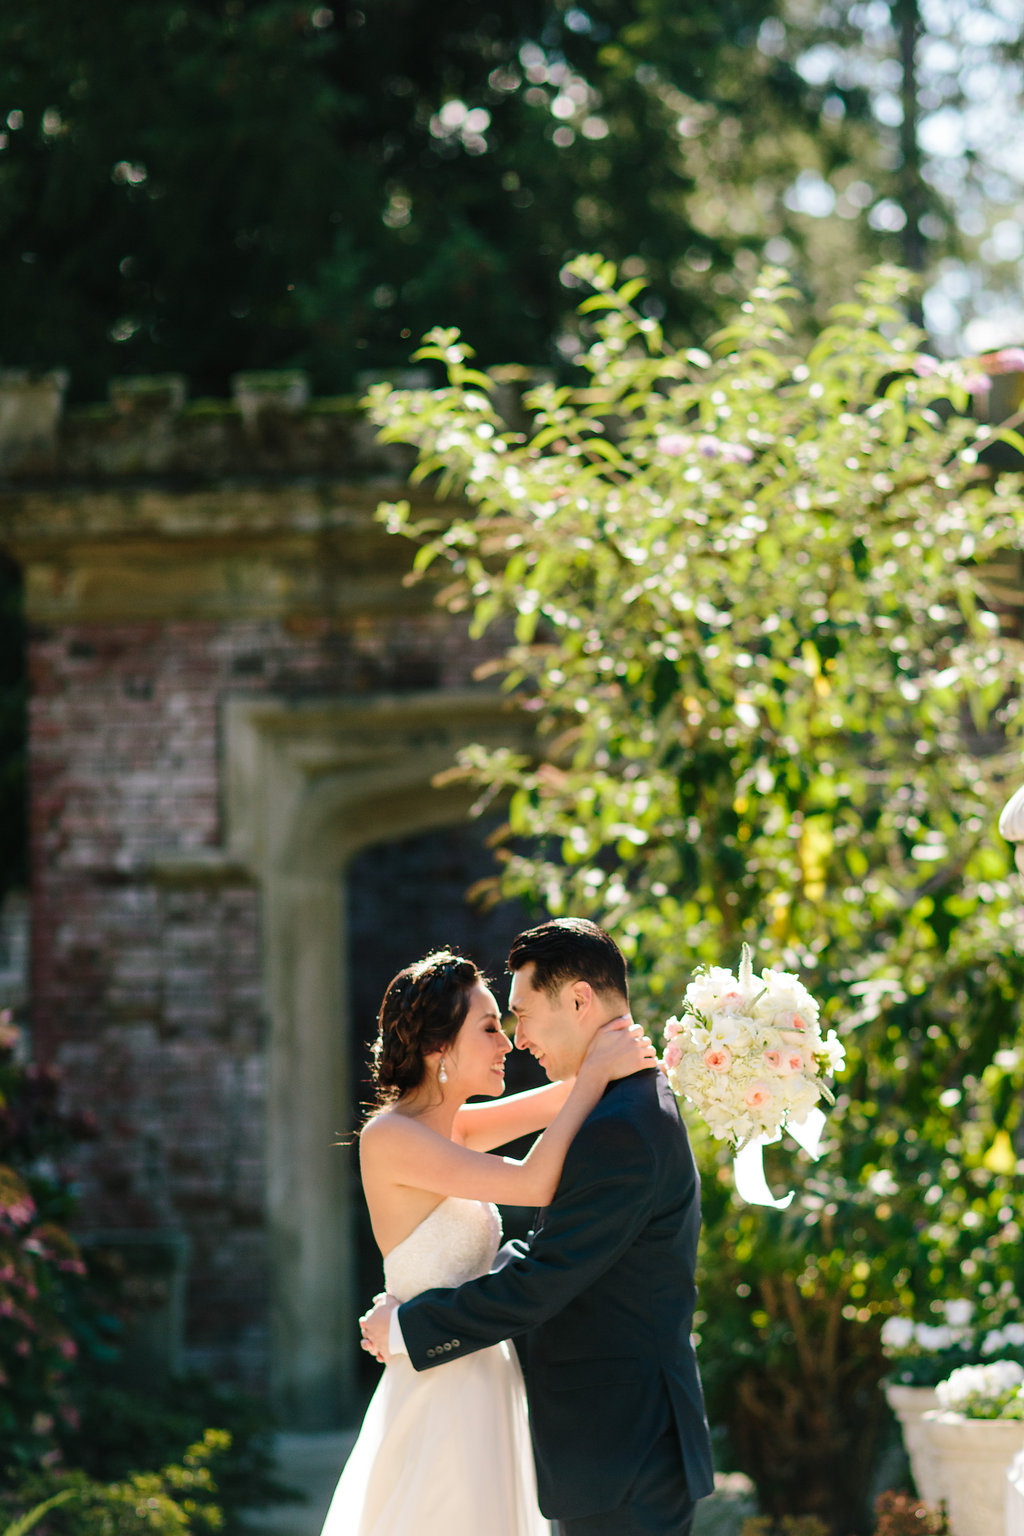 Kellylemonphotography_lucy+kento_weddingpreviews-16.jpg